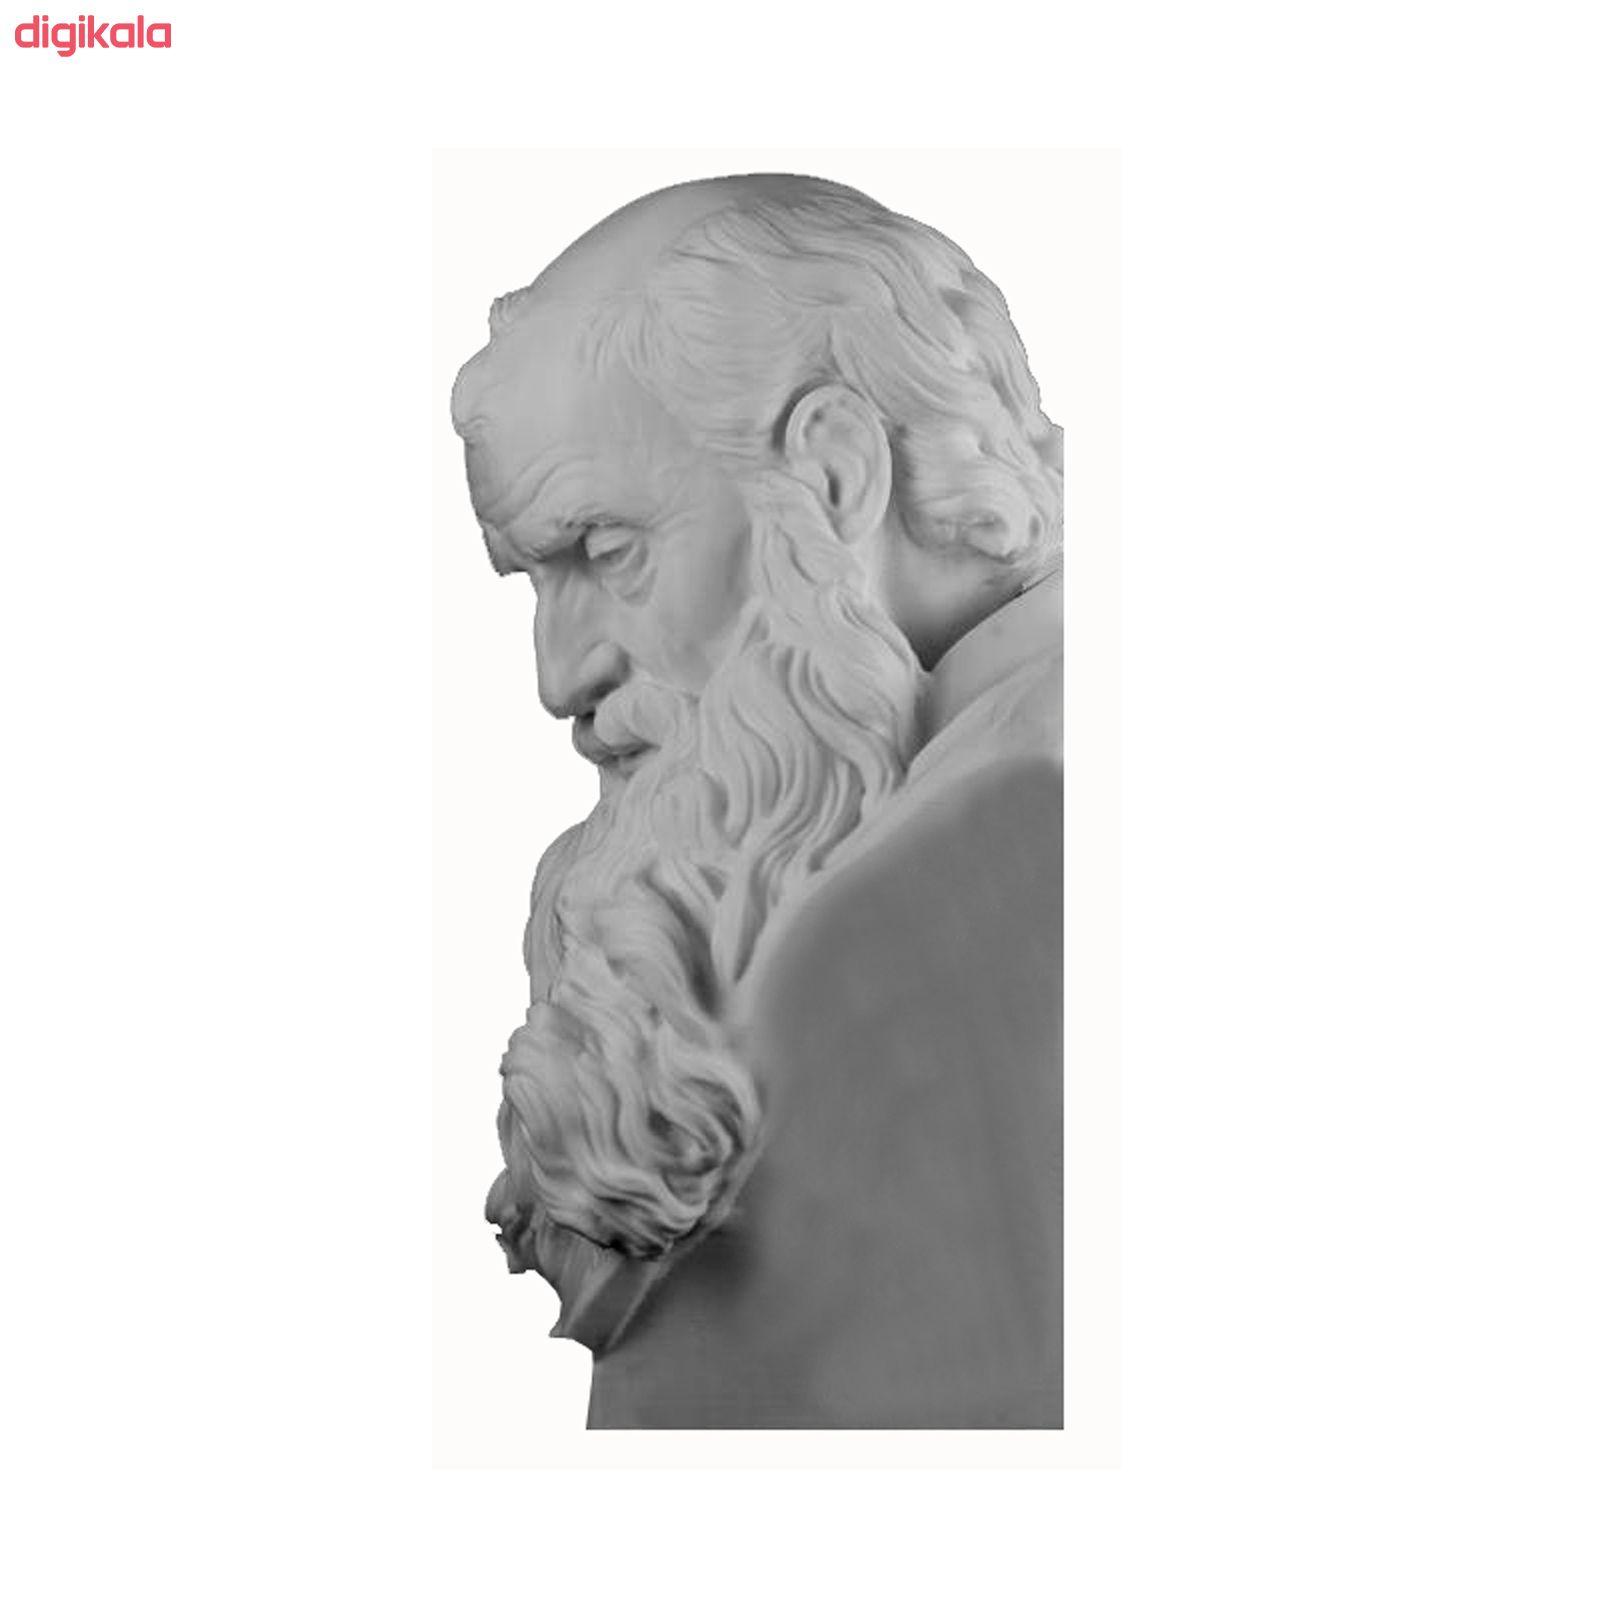 مجسمه طرح سقراط مدل x1016 main 1 2